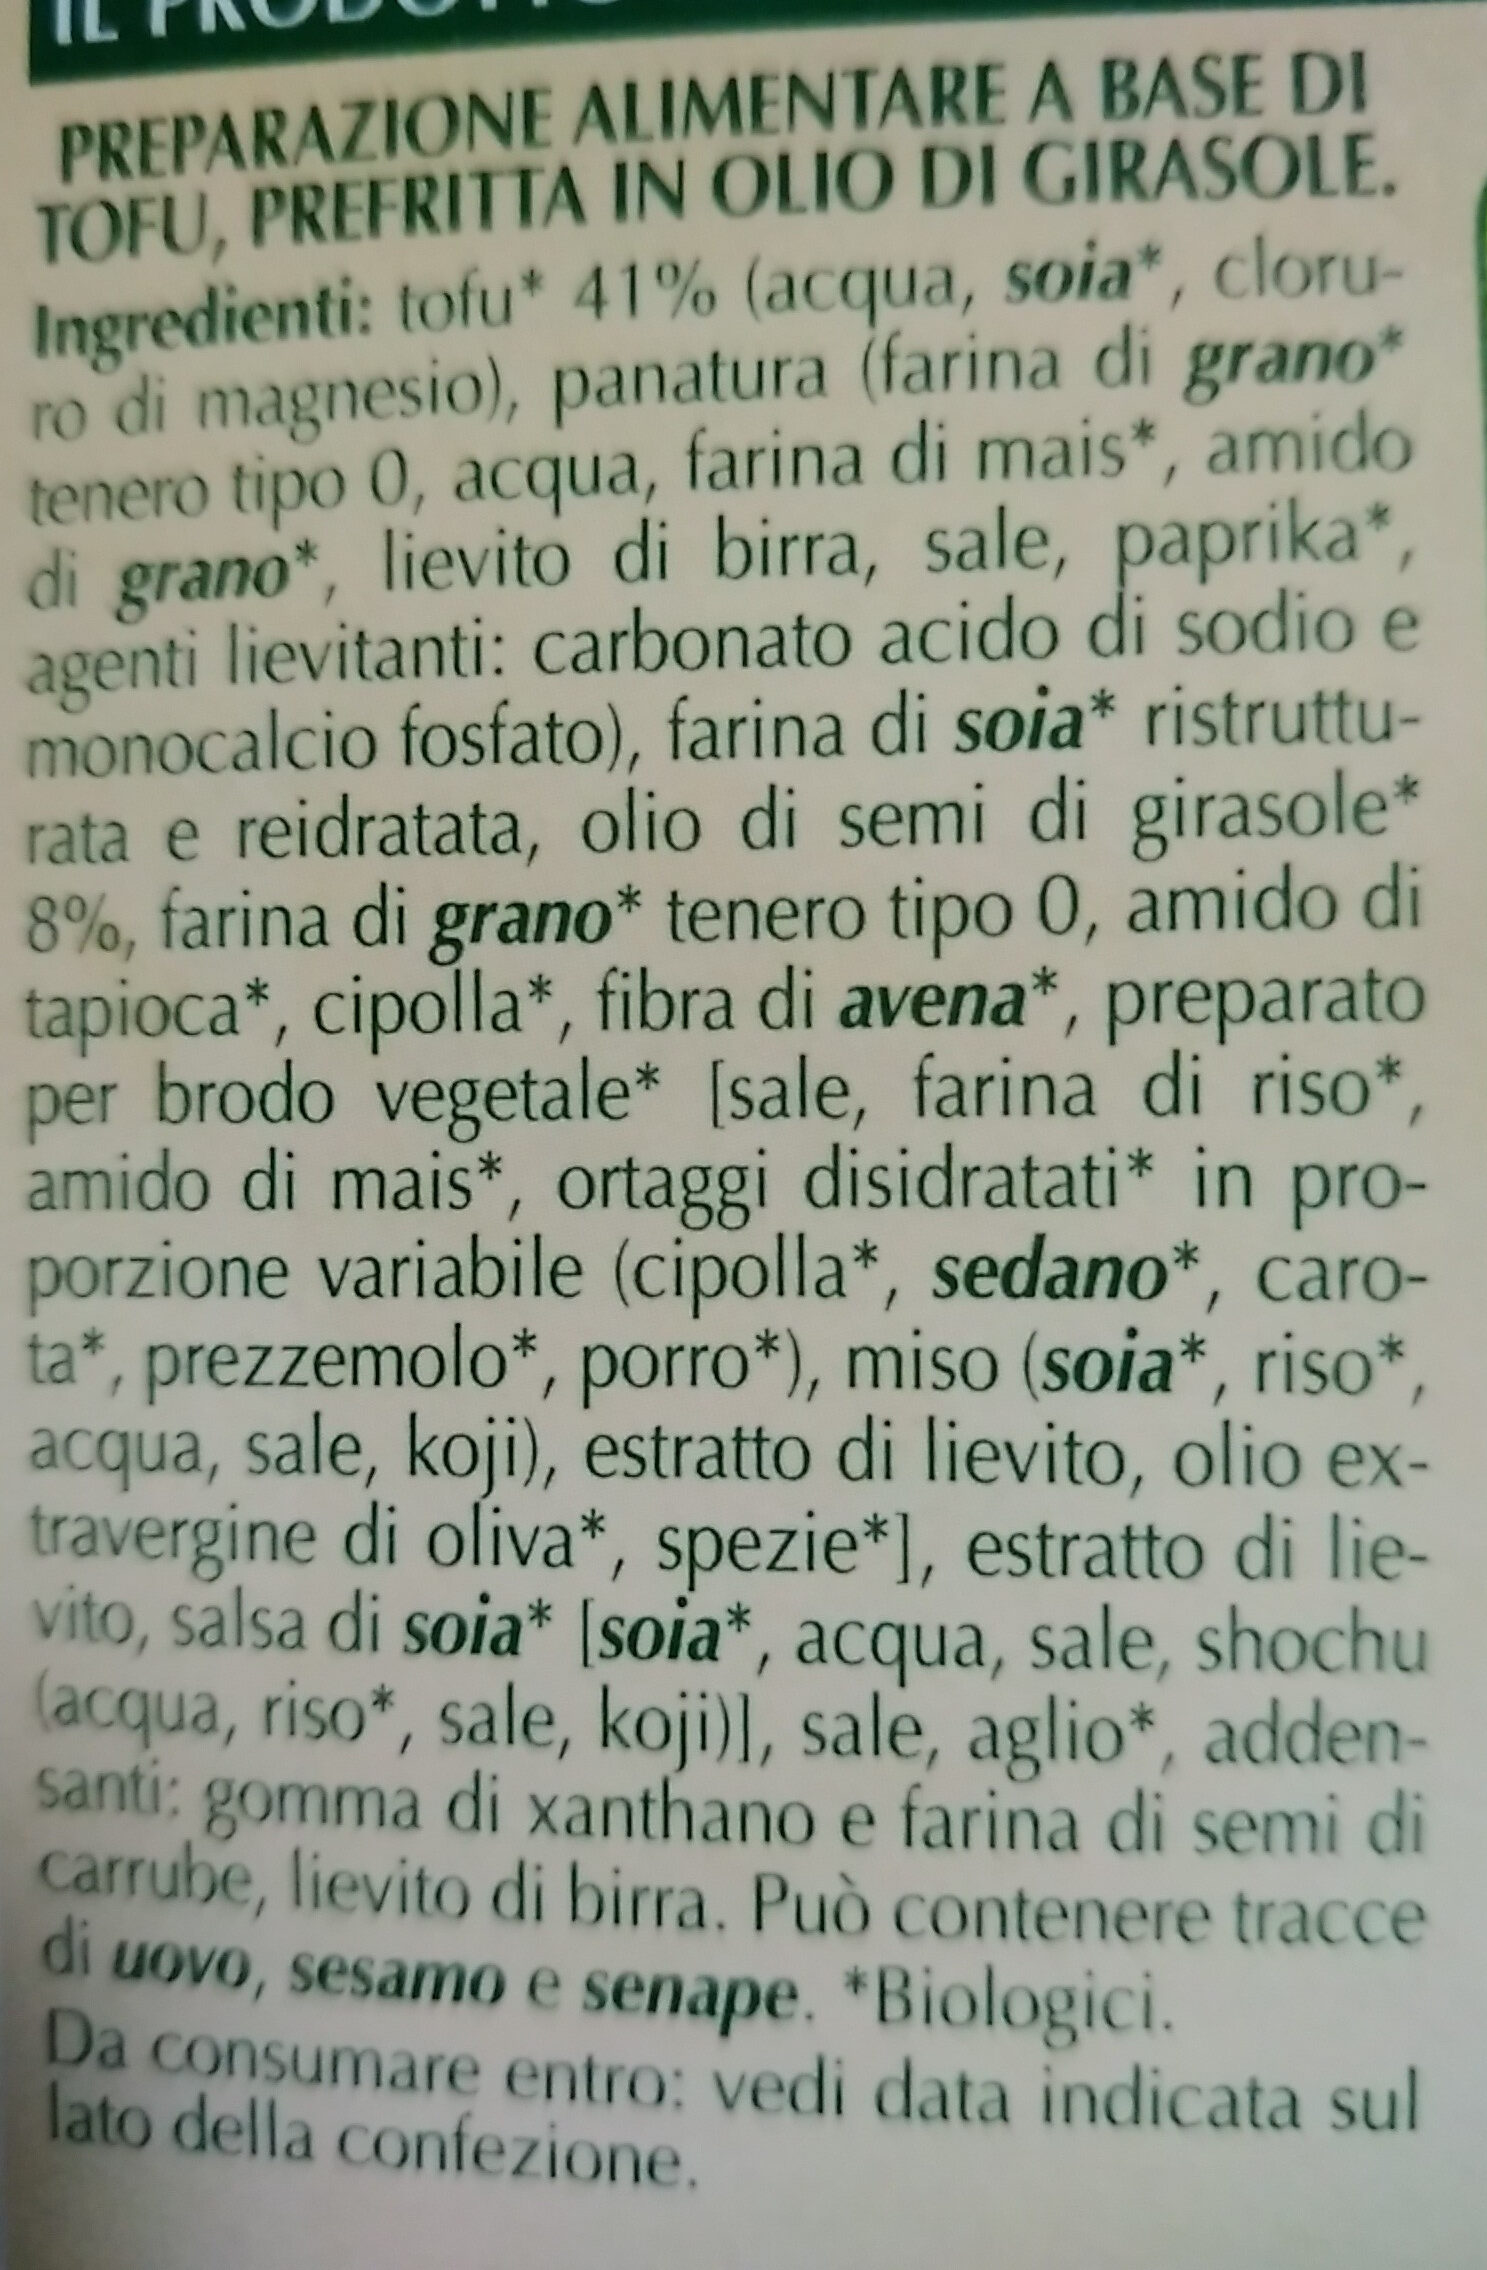 Cotolette vegetali - Ingredients - it